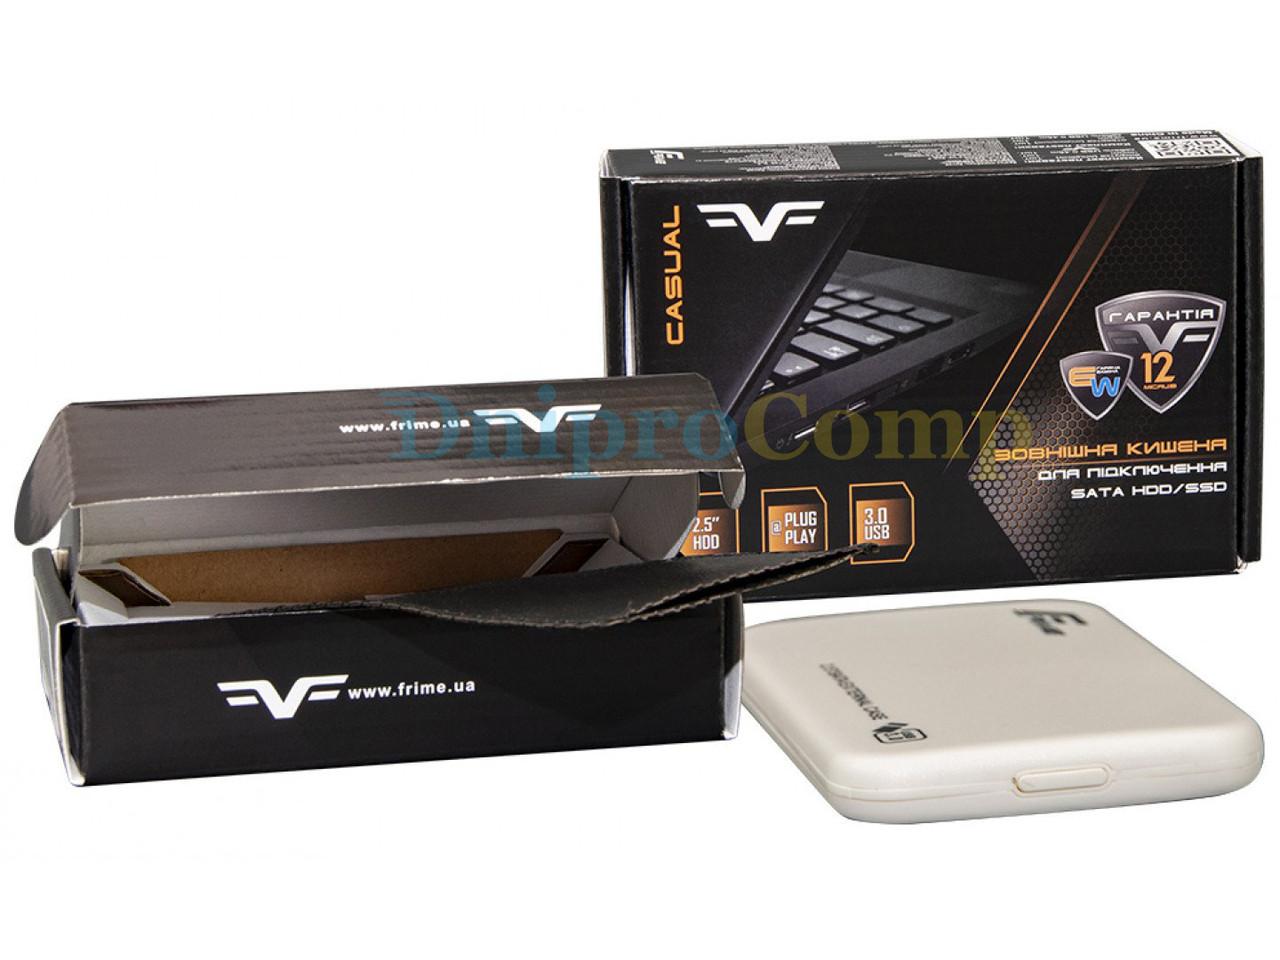 "Внешний карман Frime SATA HDD/SSD 2.5"", USB 3.0, Plastic, White (FHE71.25U30)"